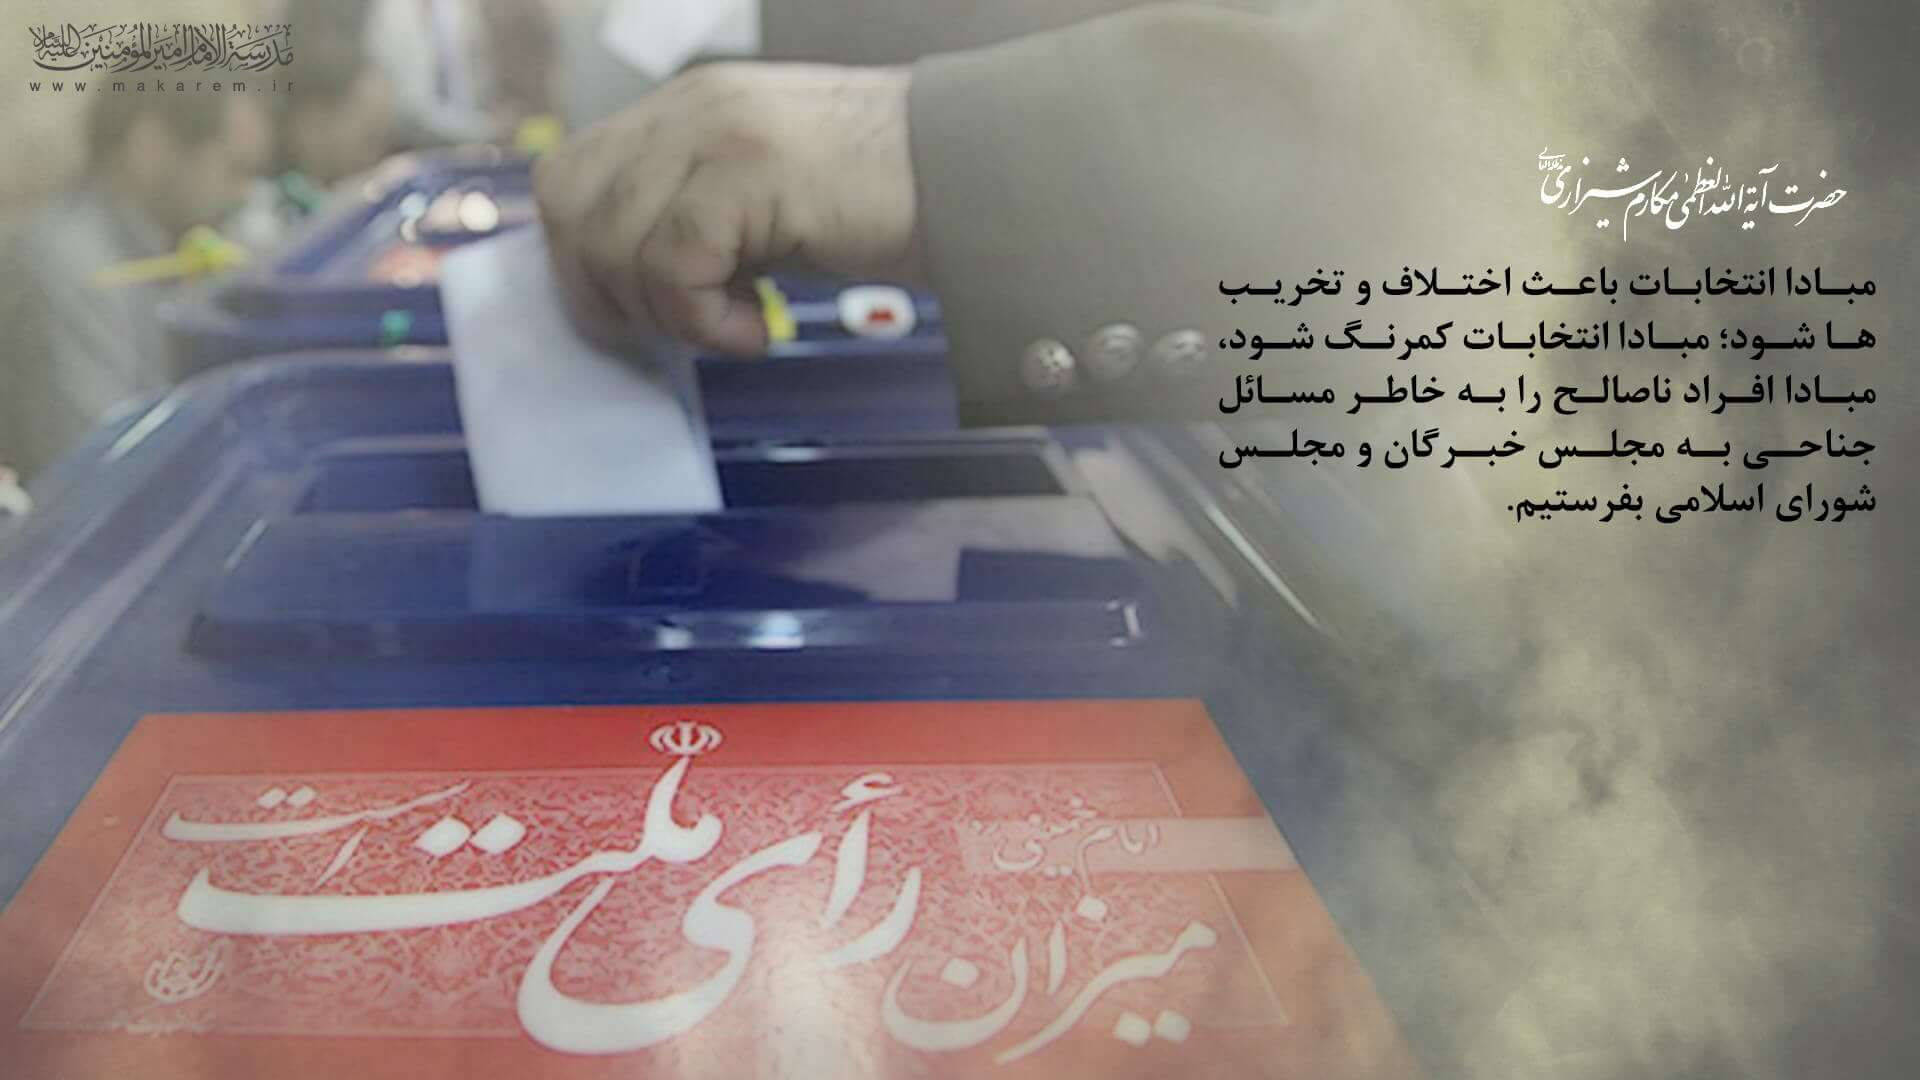 انقلاب 04-مدرسه الامام امیر المومنین (ع)